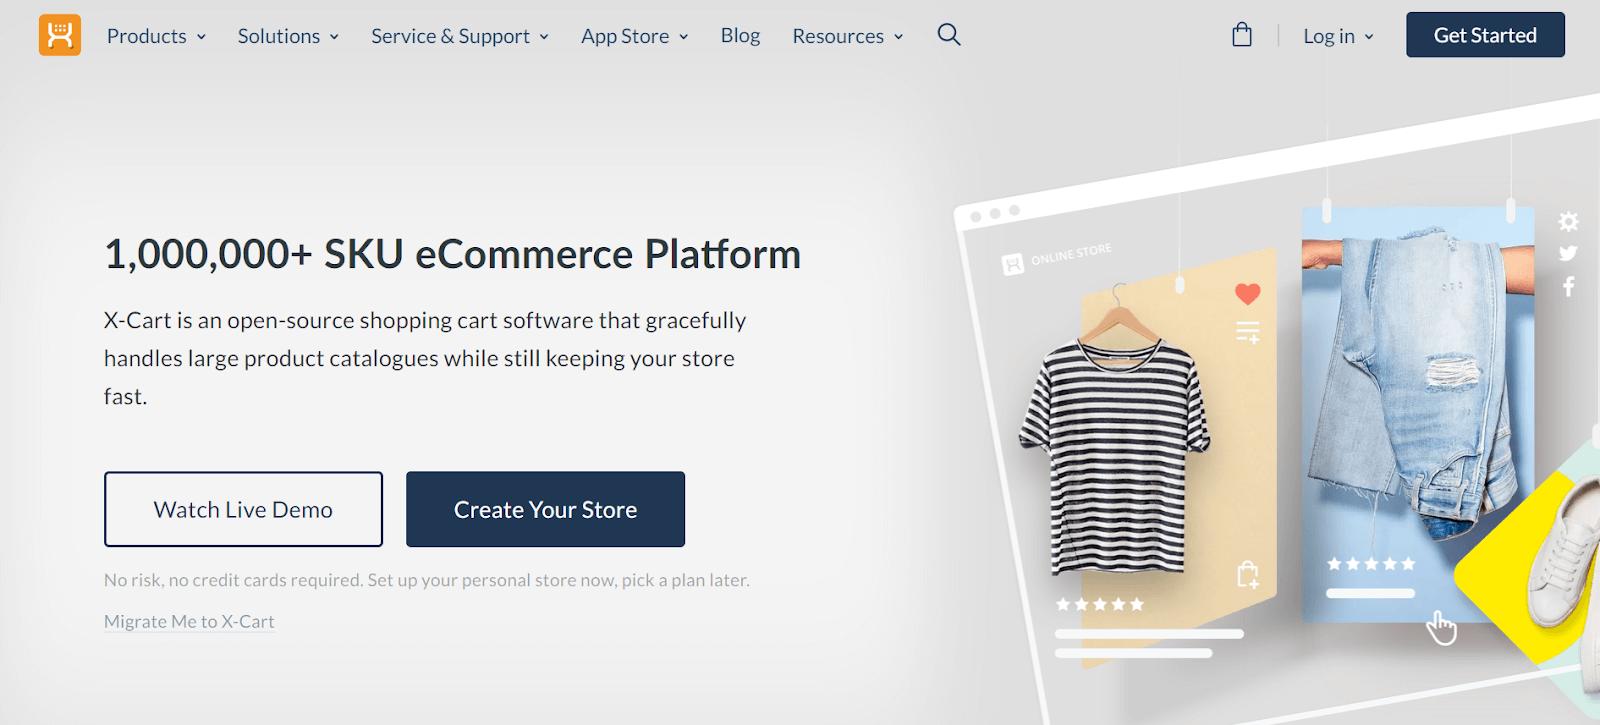 X-Cart Ecommerce Platforms